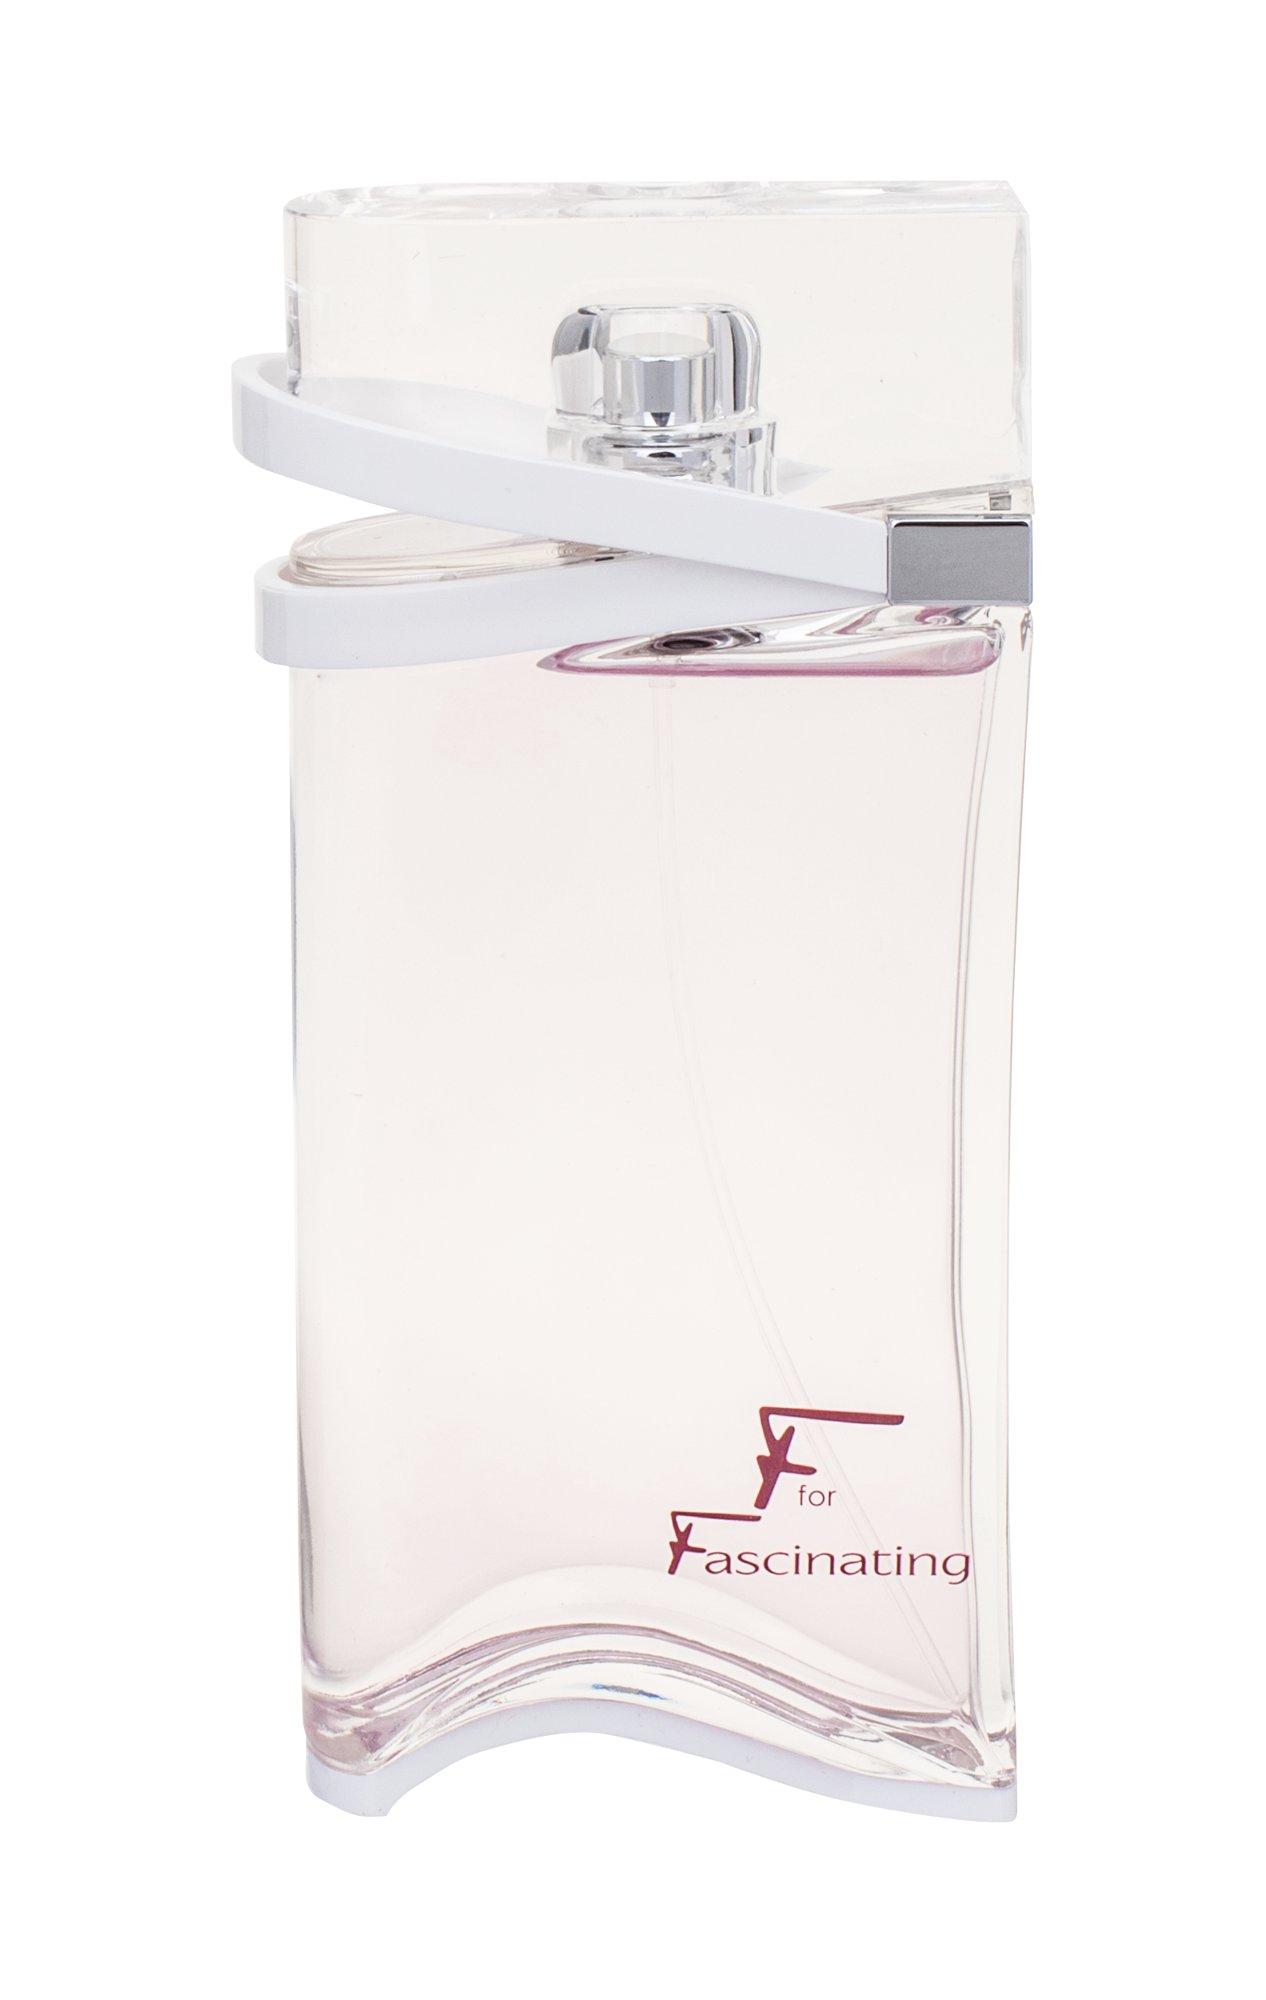 Salvatore Ferragamo F for Fascinating, Toaletná voda 90ml